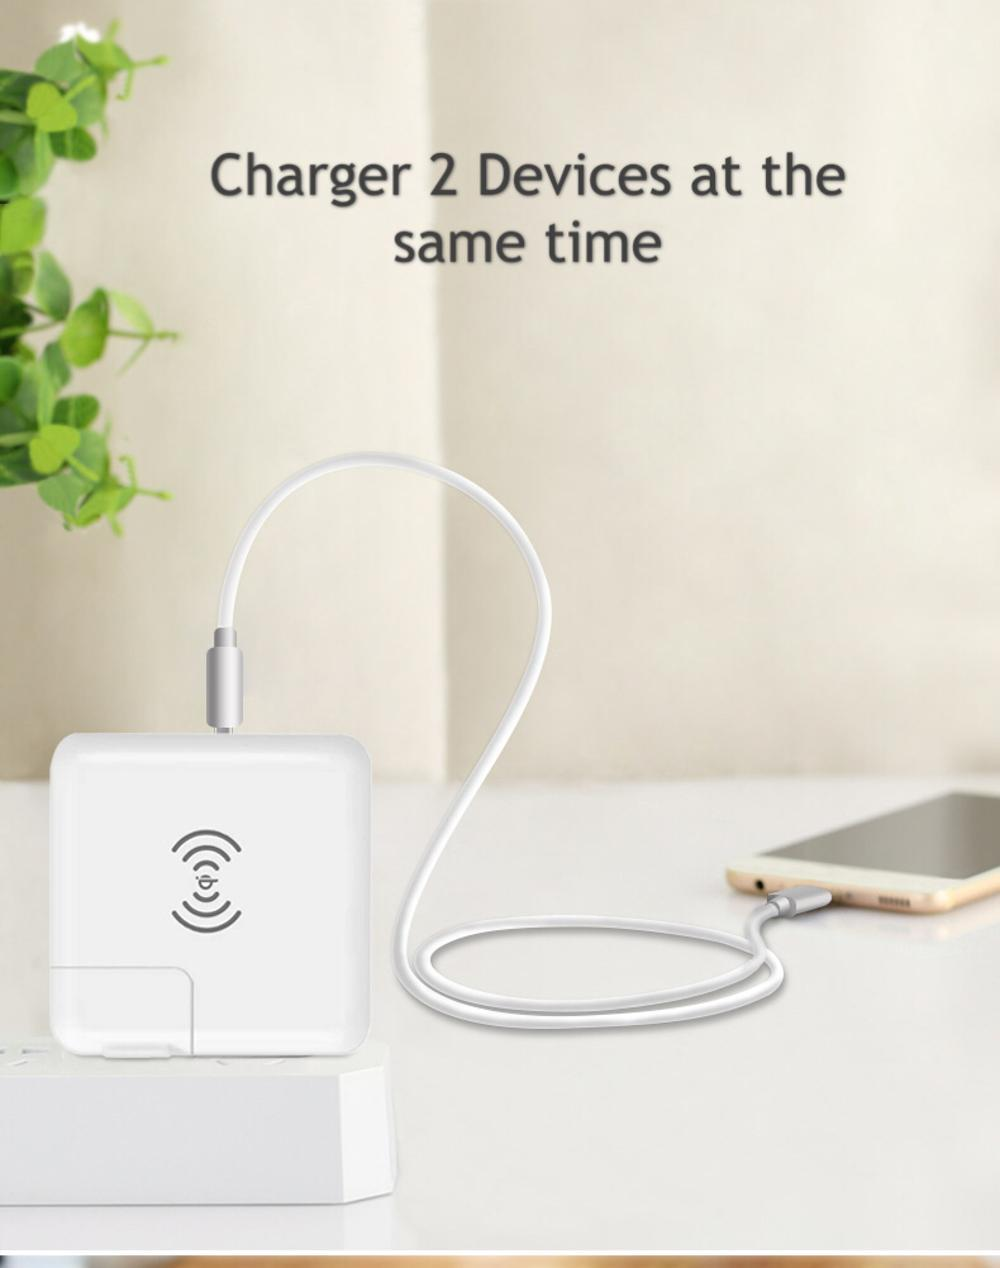 Wholesale universal travel charger Qi wireless mulifunctional power bank 6700mAh 10